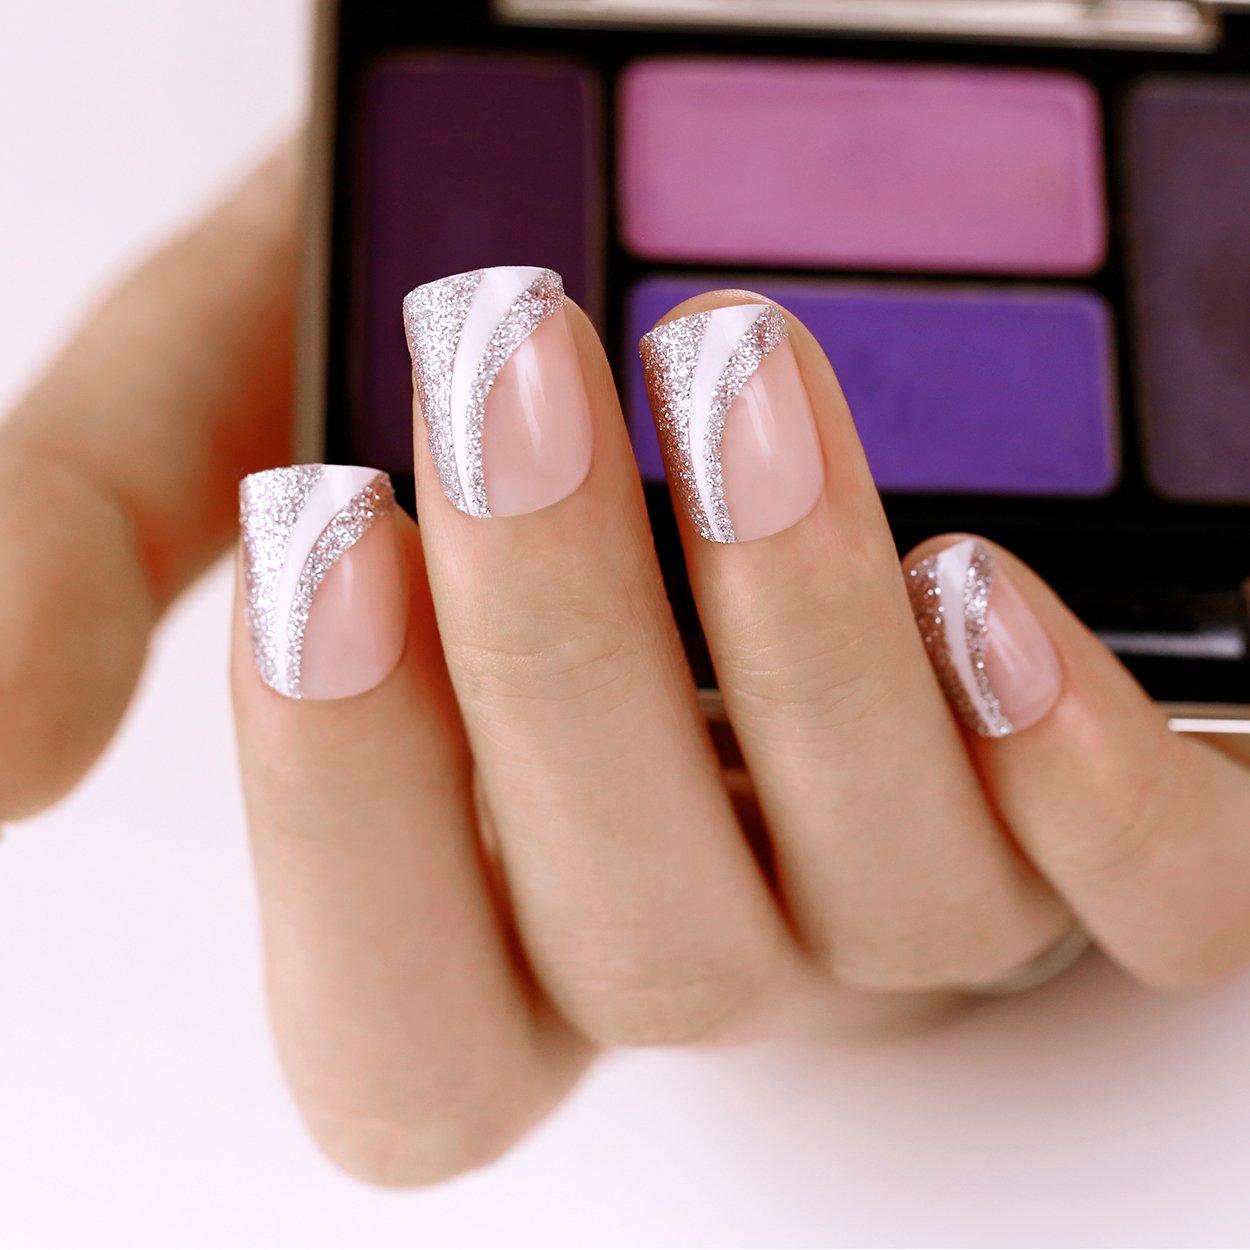 ArtPlus Uñas Postizas Falsas Artificial 24pcs Saturn Silver Elegant Touch False Nails with Glue Full Cover Medium Length Fake Nails Art: Amazon.es: Belleza